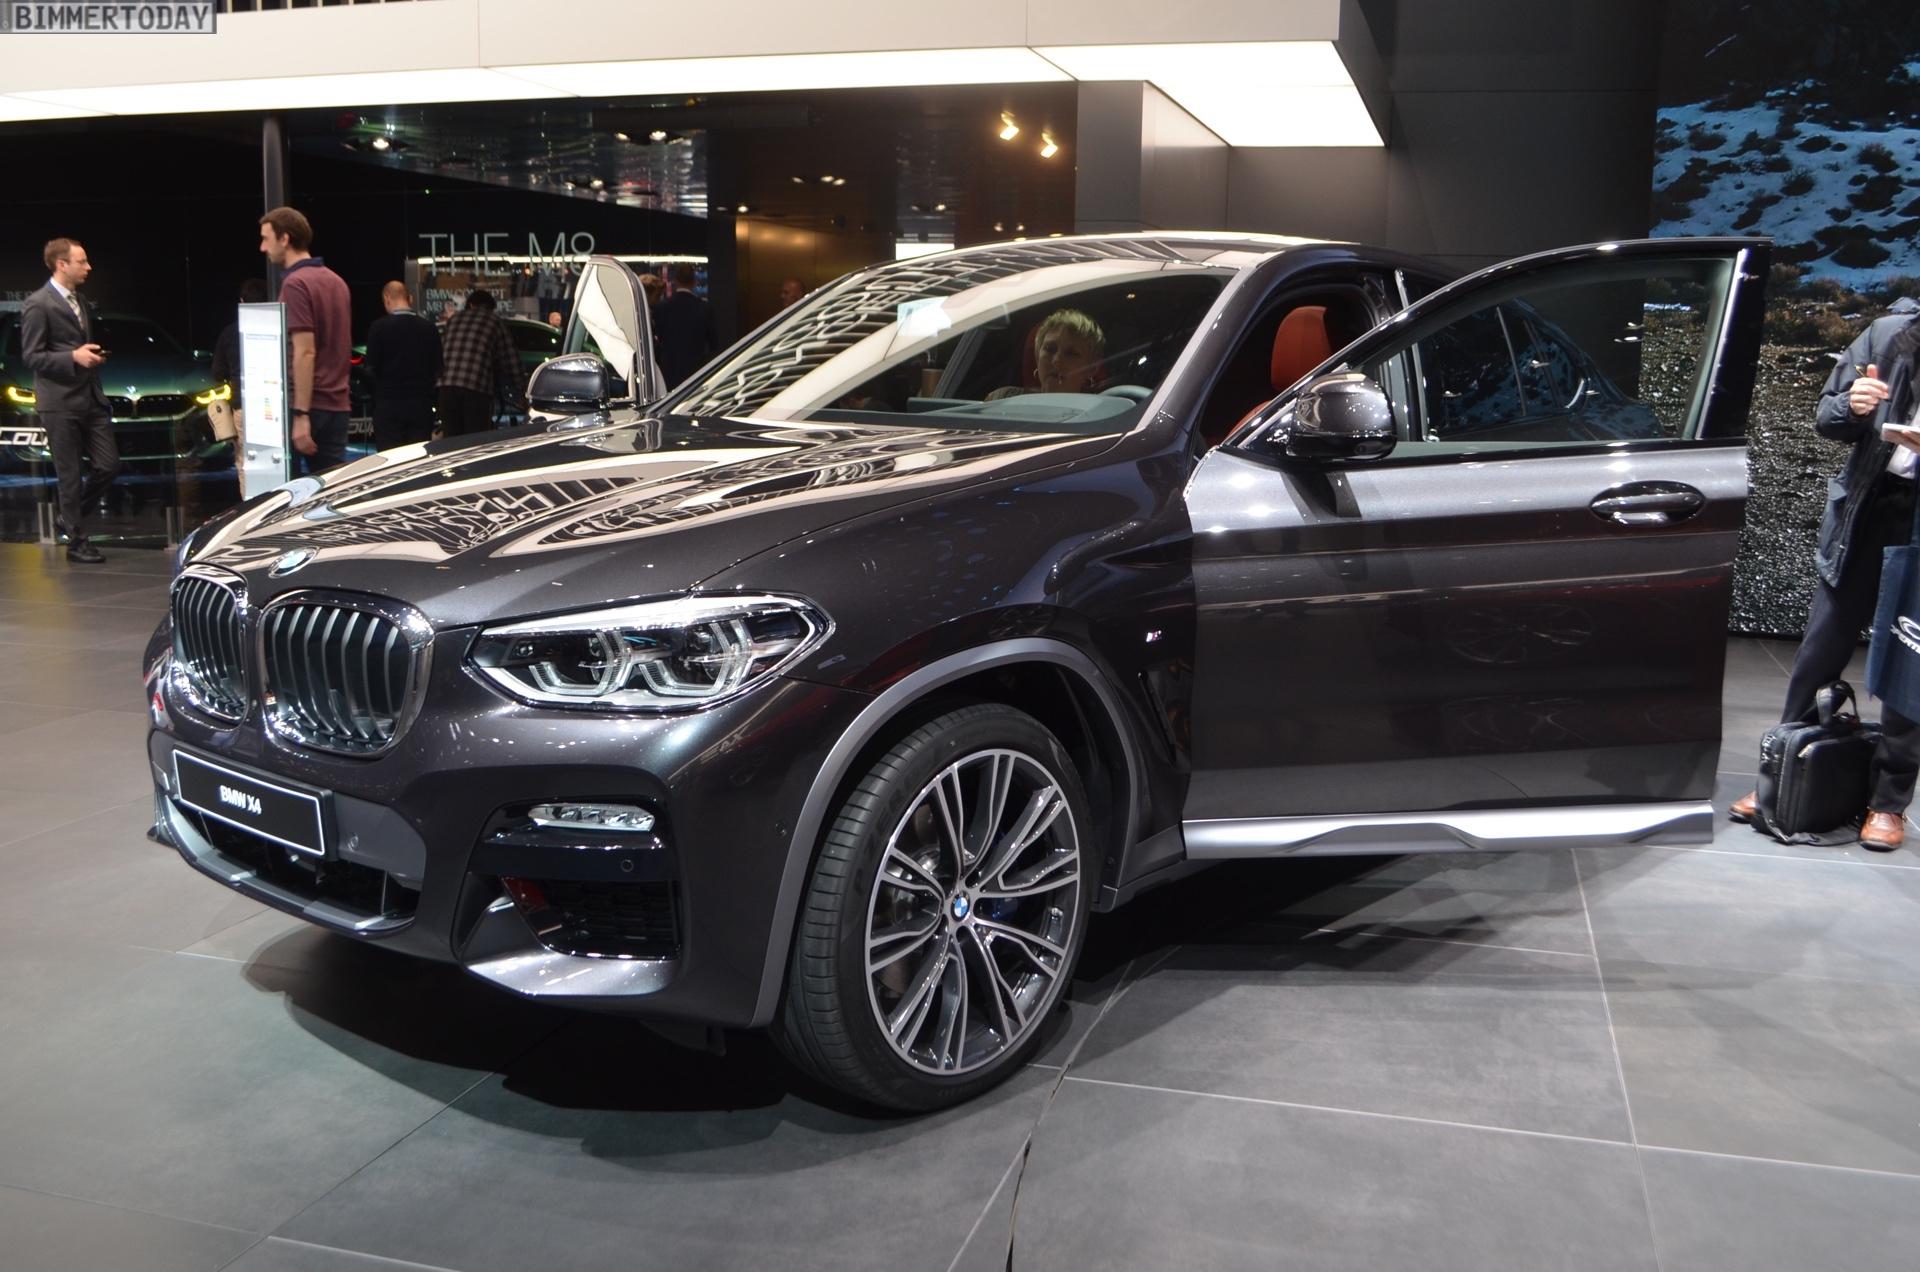 2018 Geneva Motor Show New Bmw X4 In Sophisto Grey